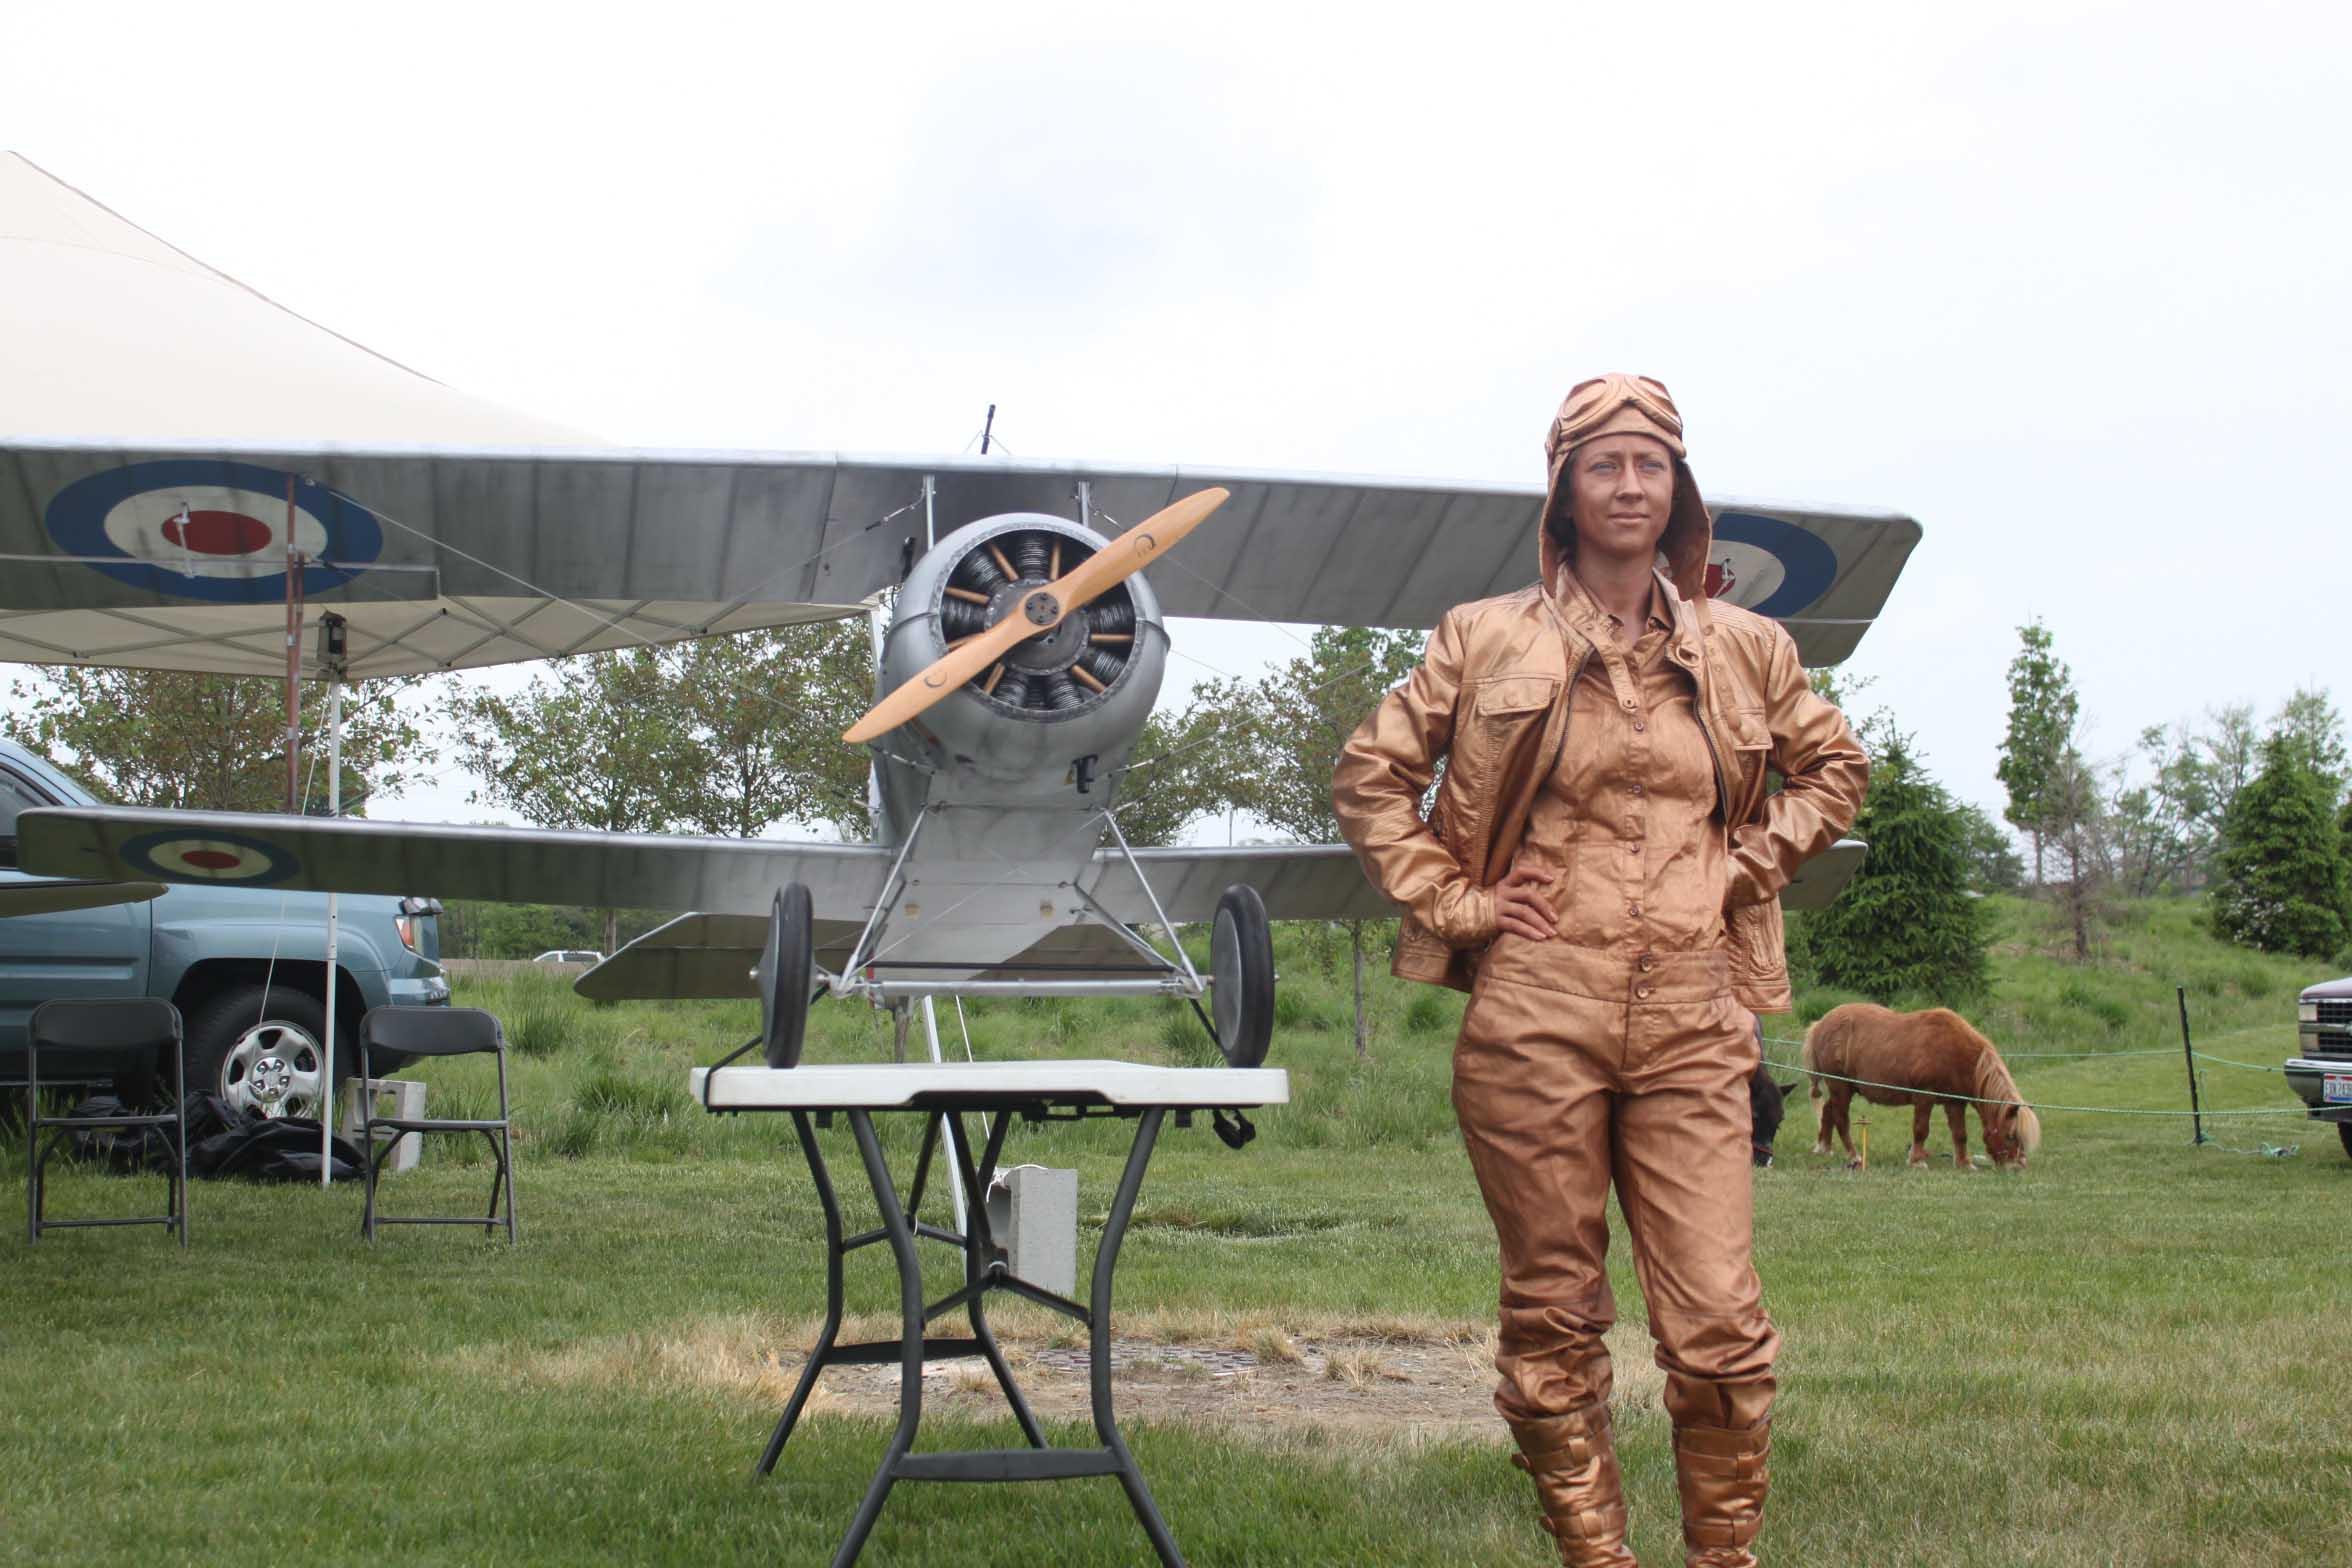 Living Statues_Amelia Earhart 02.JPG